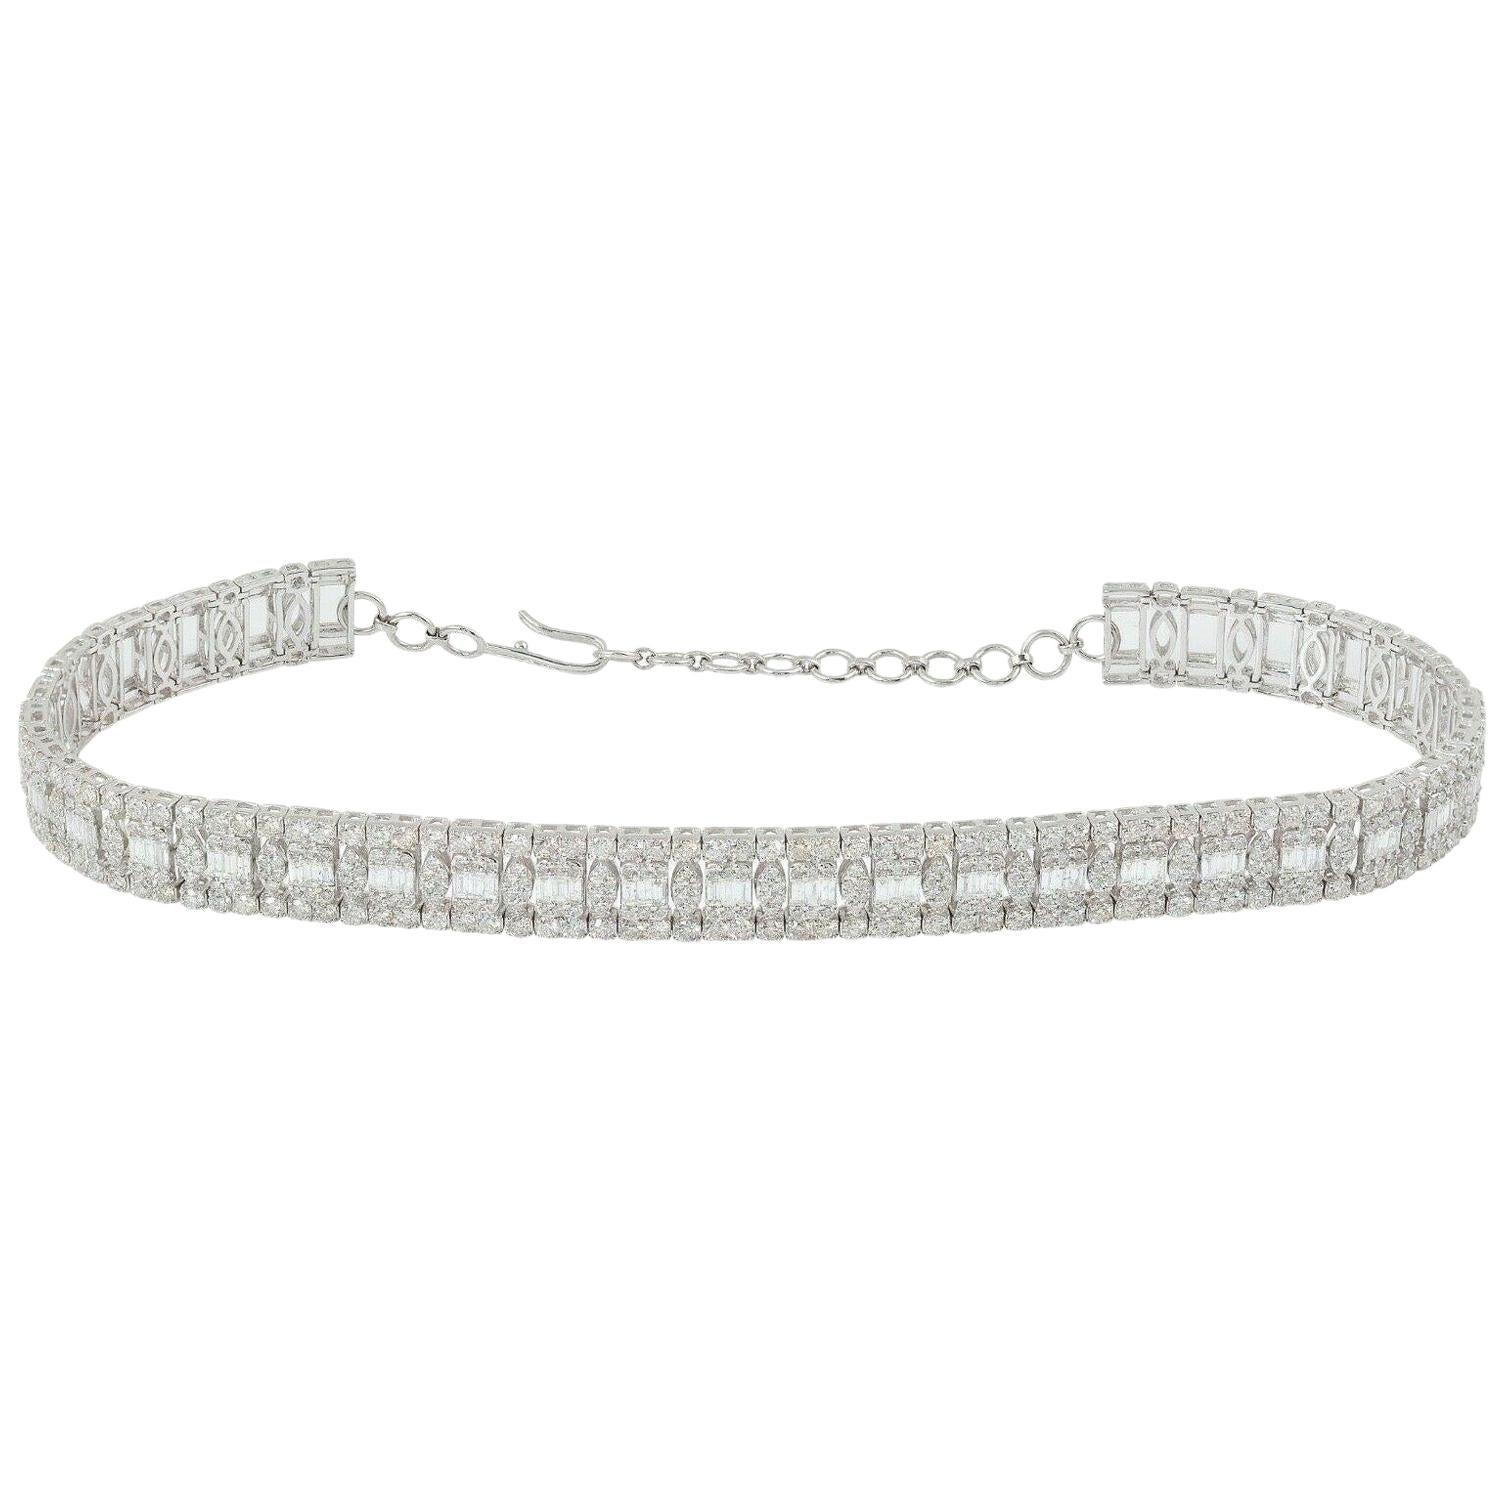 13.35 Carat Diamond 18 Karat White Gold Choker Necklace